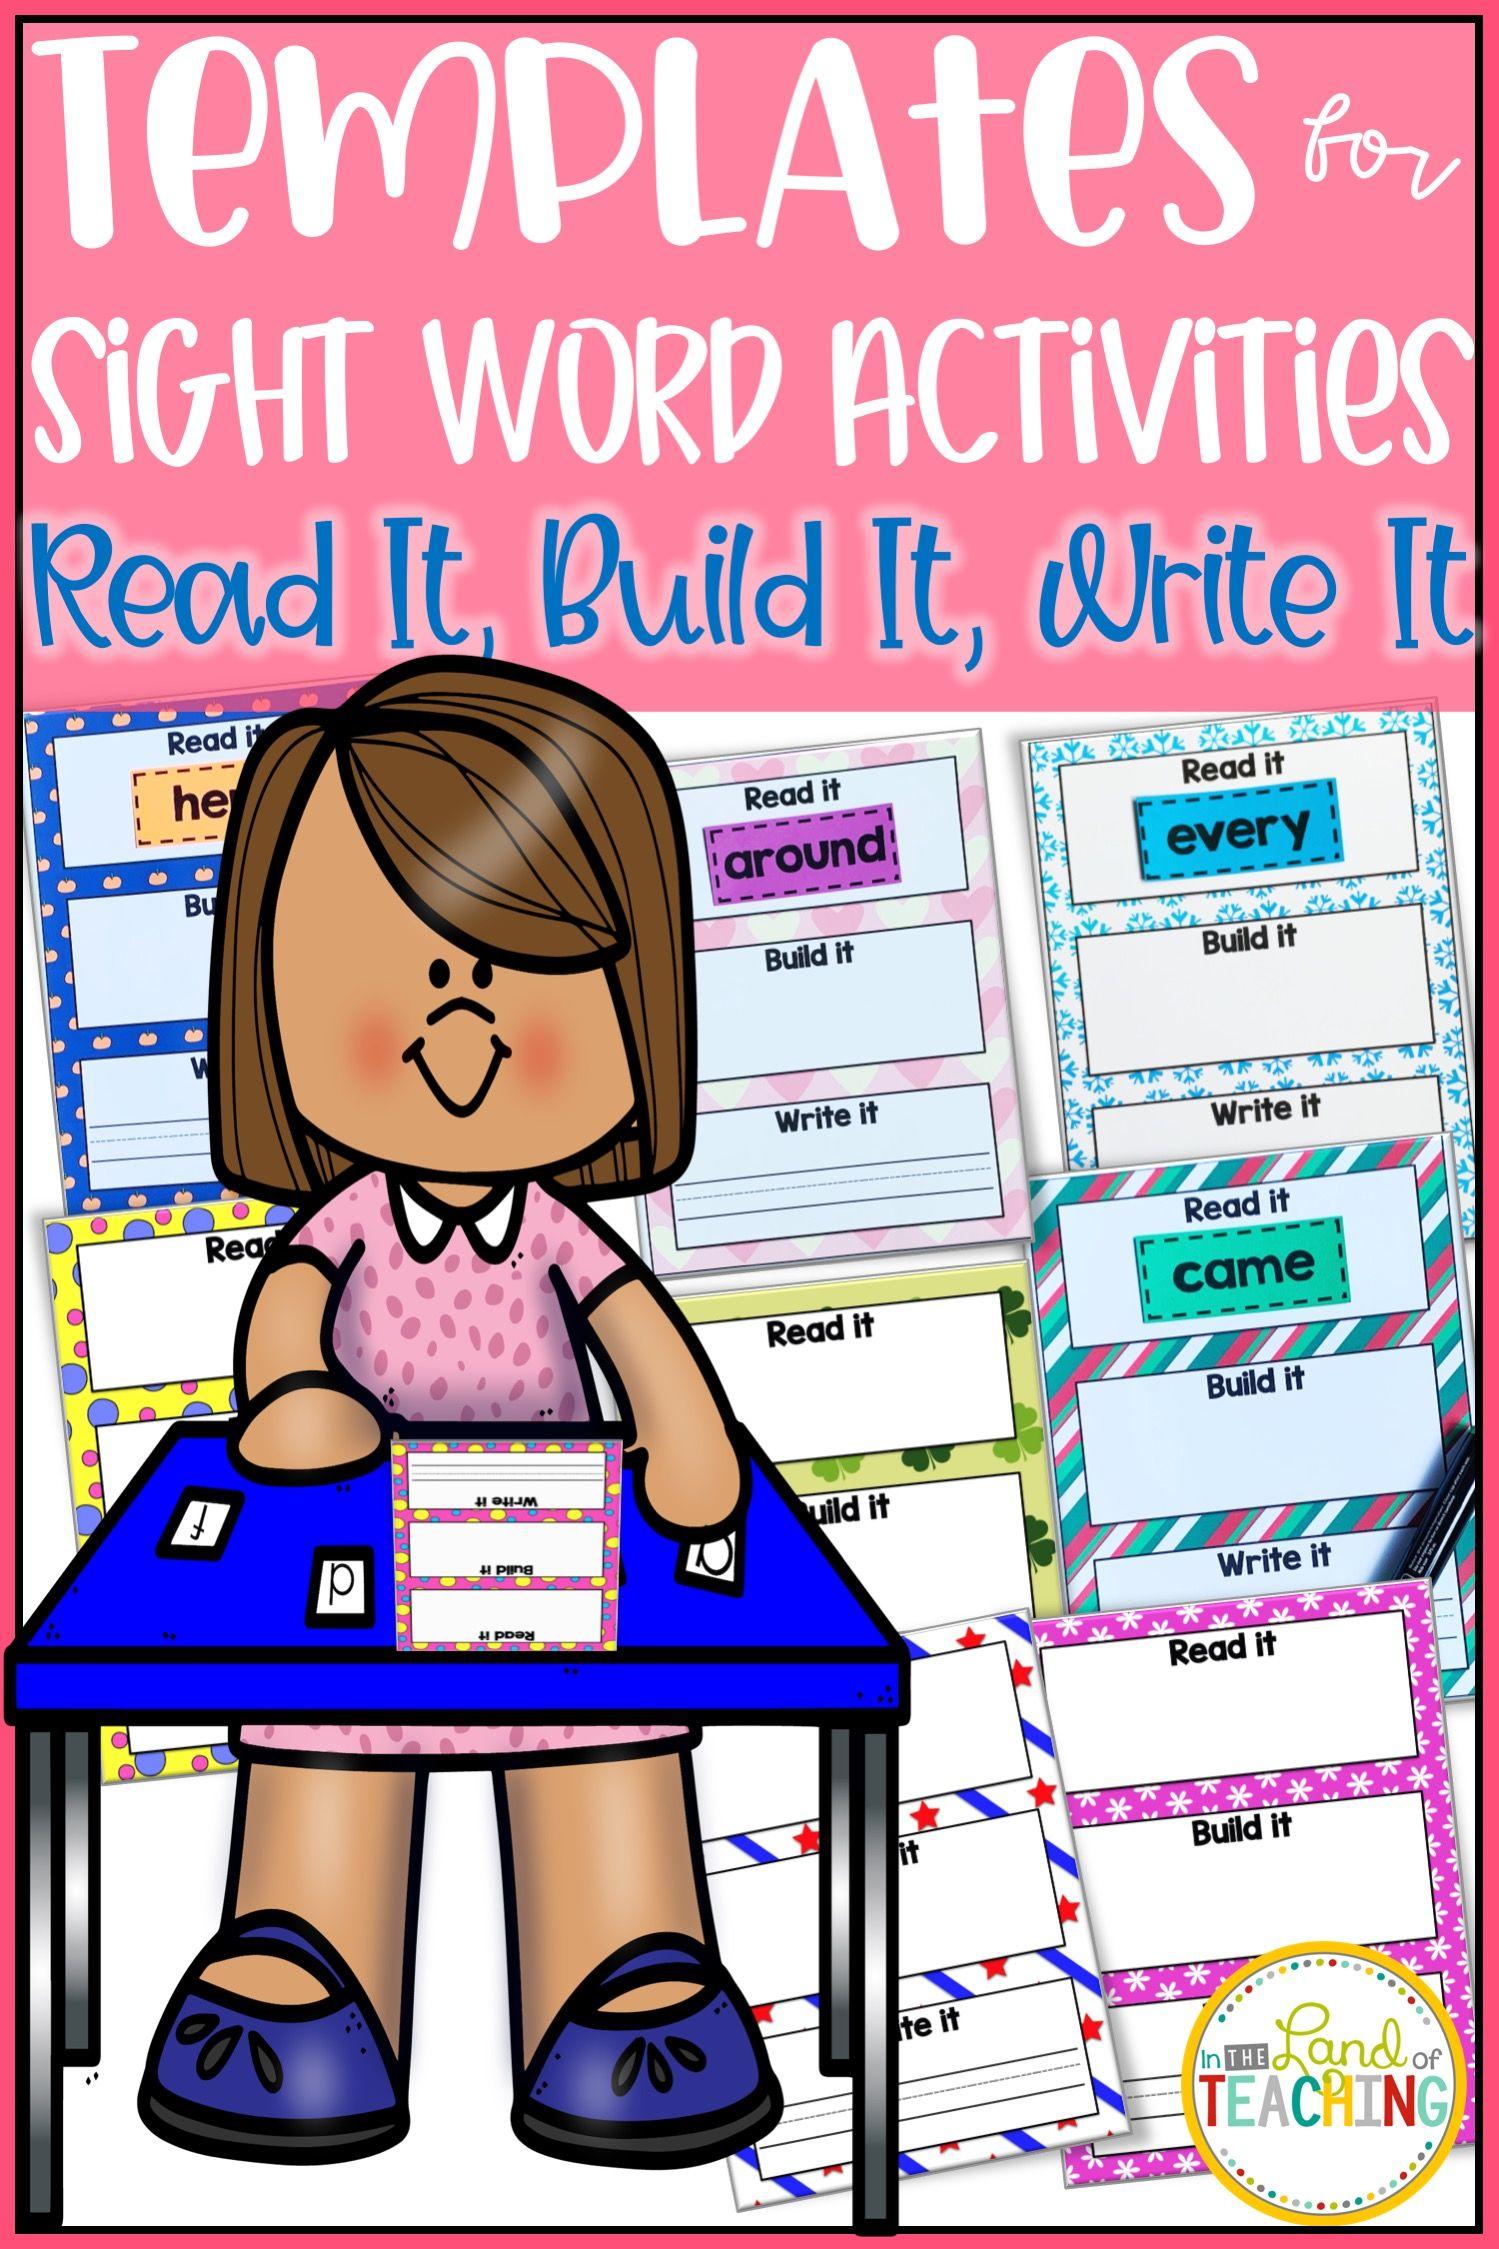 Work Mats For Sight Work Activities Sight Word Activities Work Activities Sight Words [ 2249 x 1499 Pixel ]